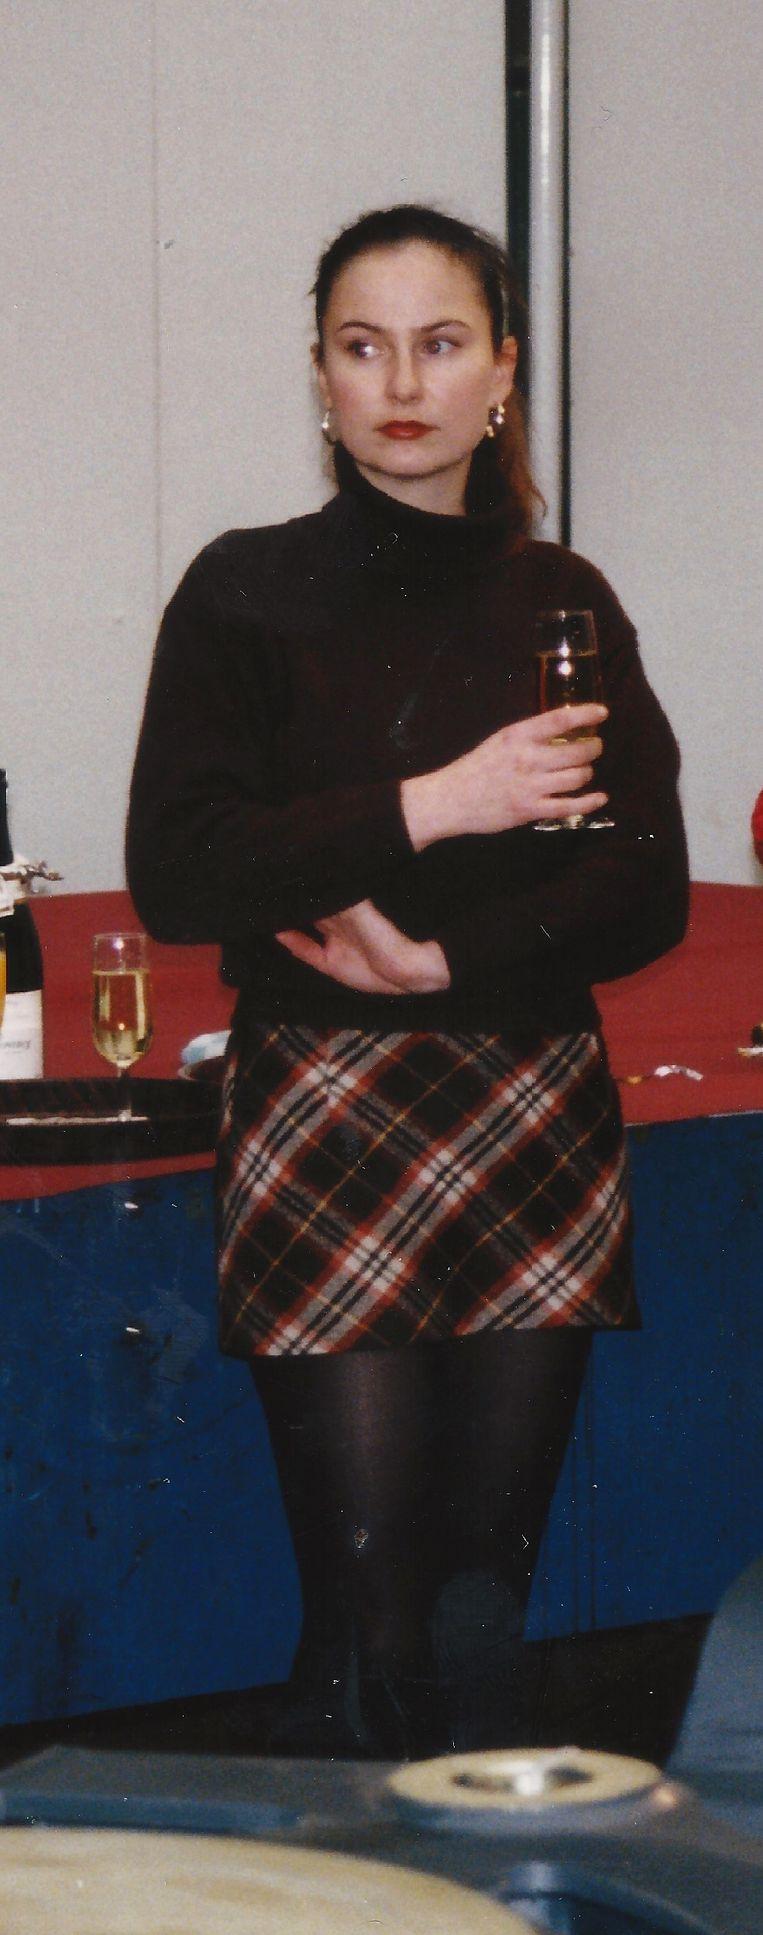 1995. Beeld privé archief